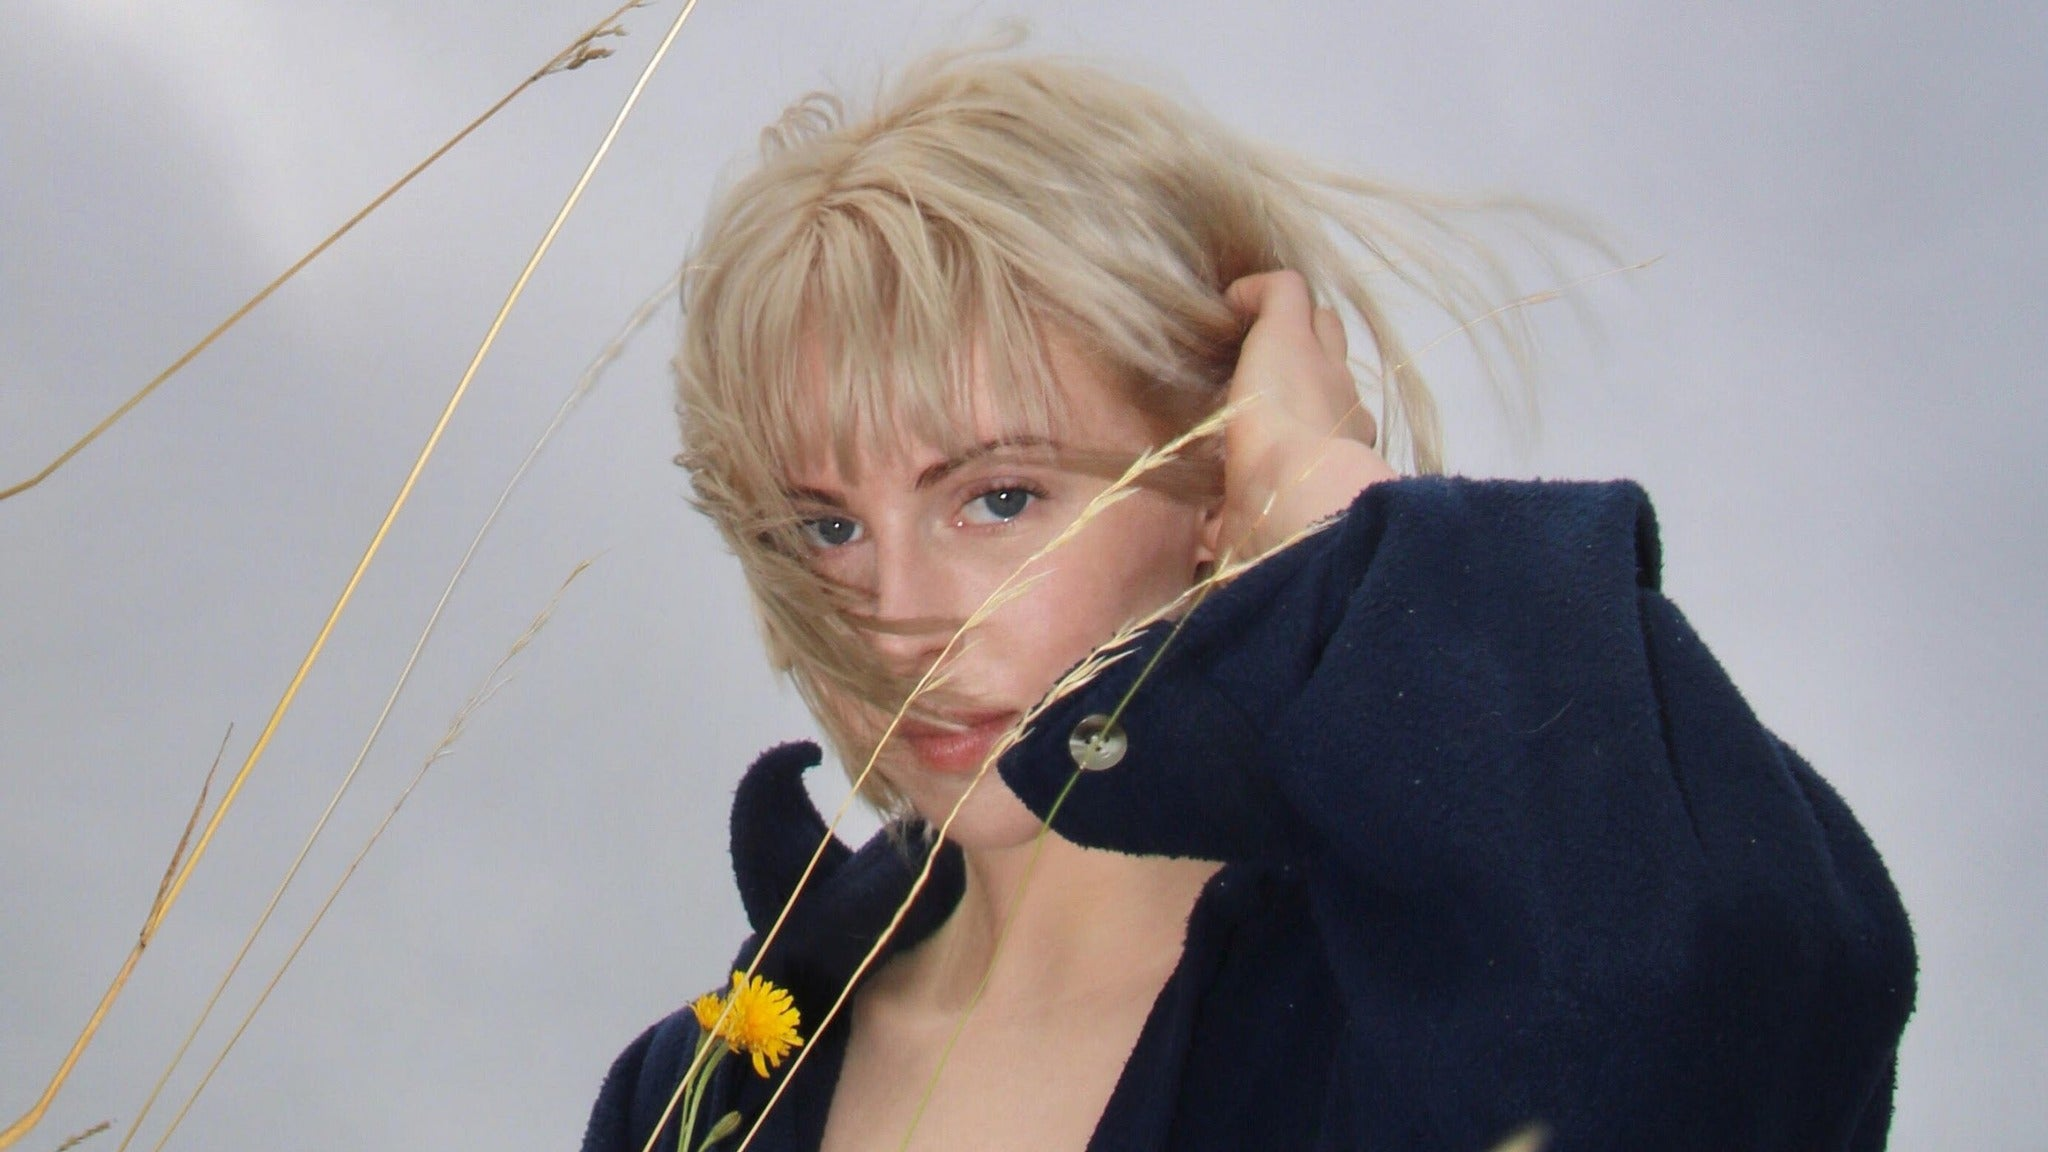 Fenne Lily & Illuminati Hotties @ 191 Toole at 191 Toole - Tucson, AZ 85701